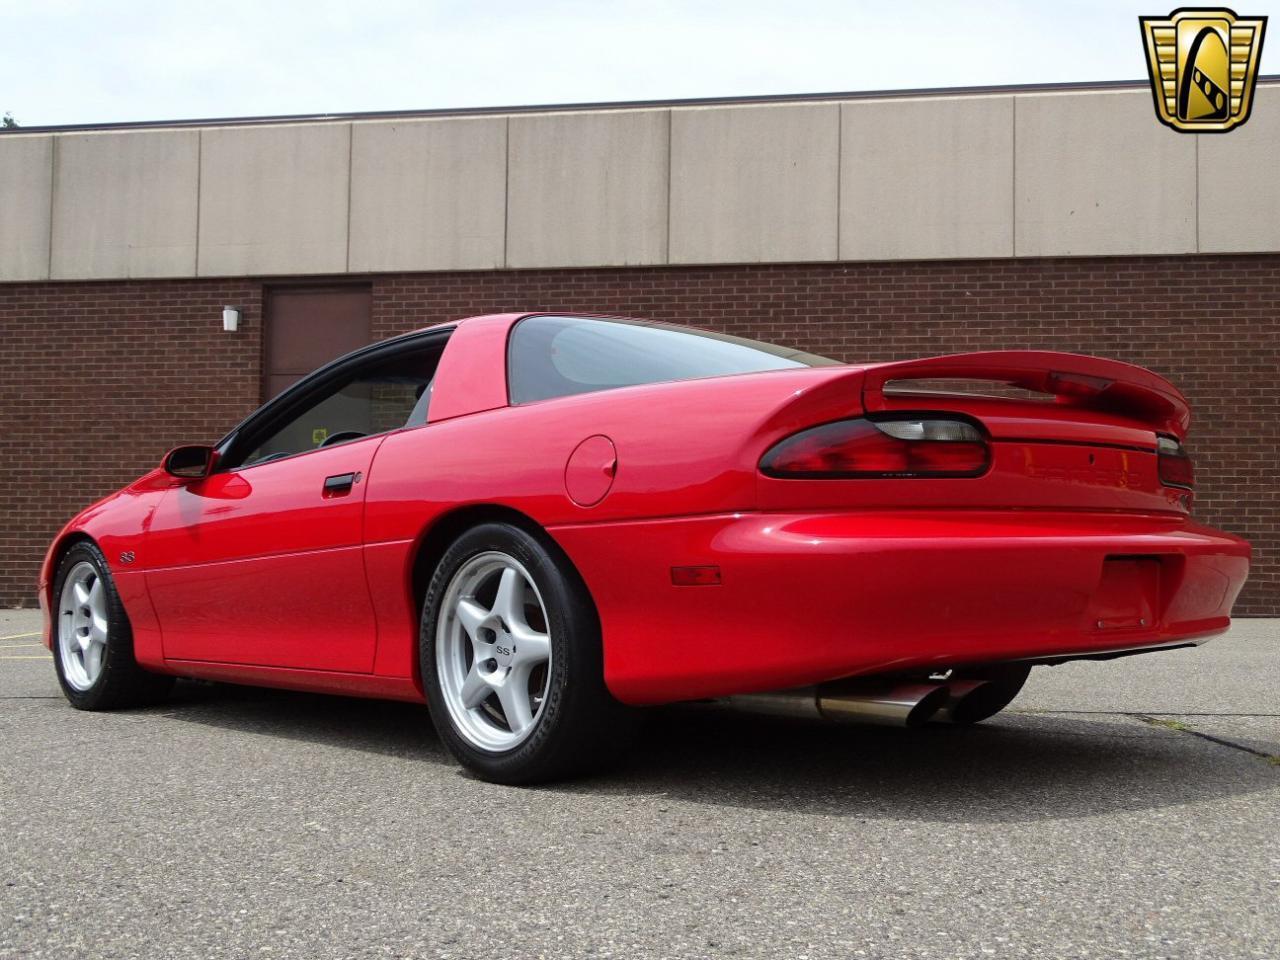 Large Picture of 1996 Camaro - $13,595.00 - LDUP